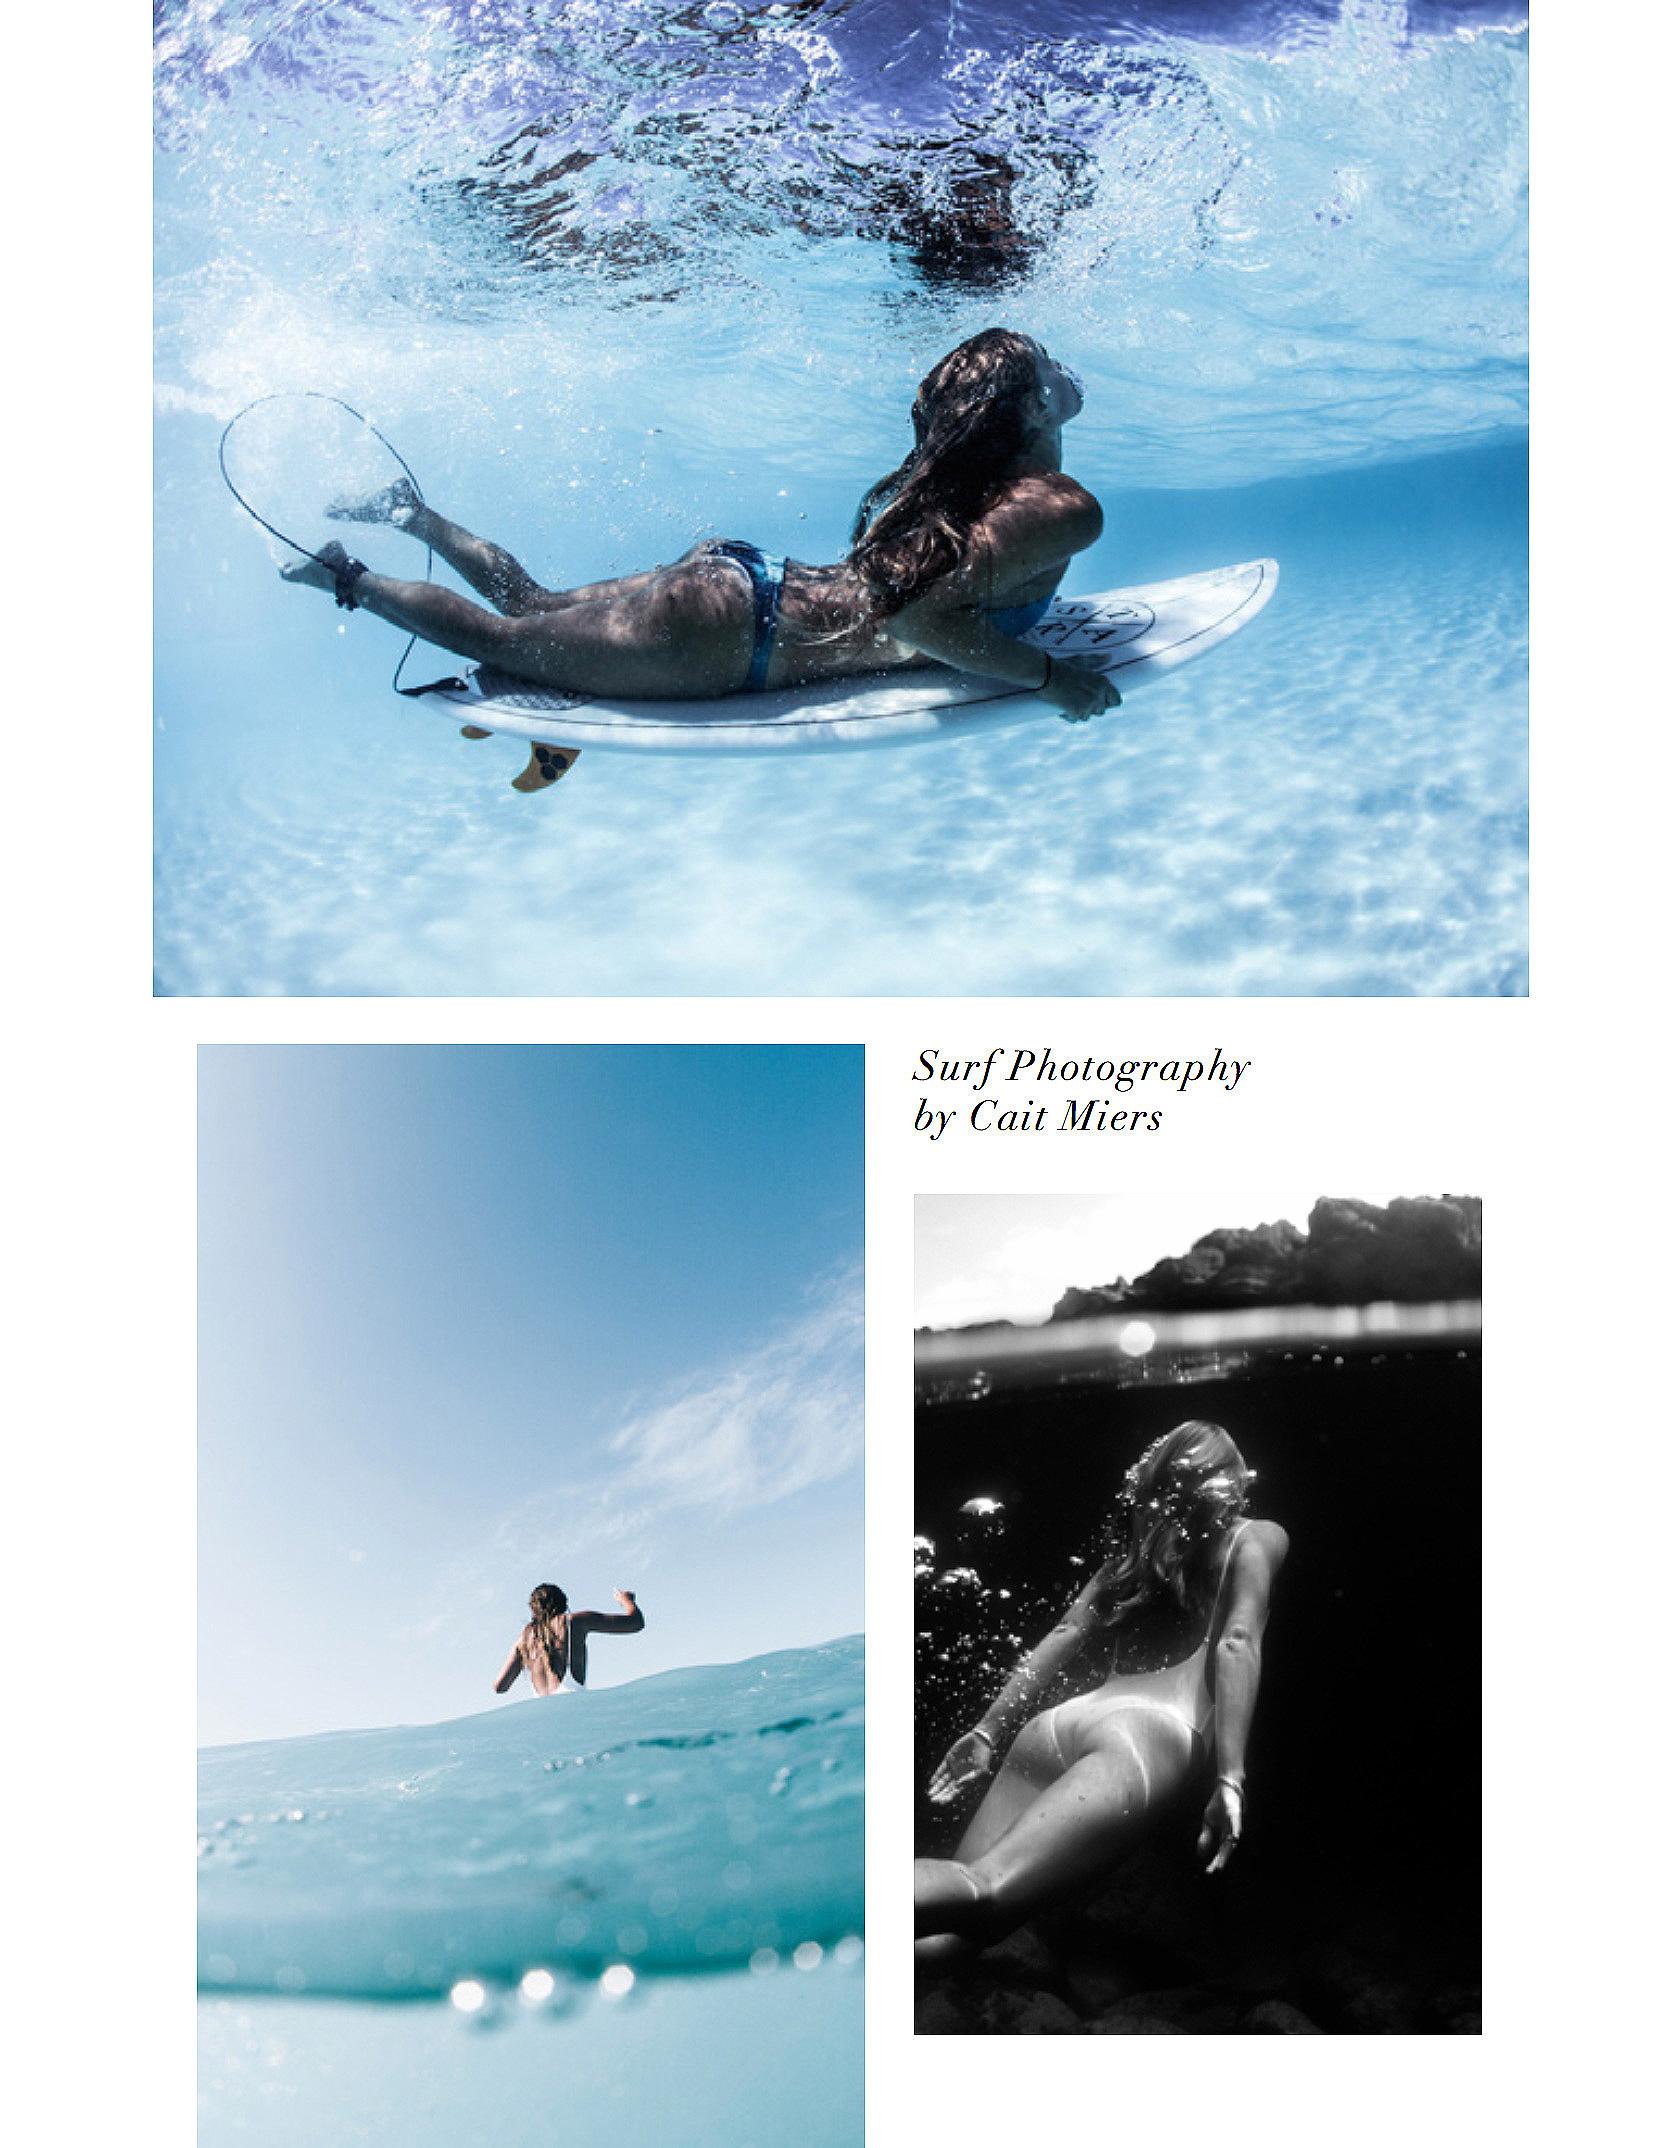 surf-photography.jpg